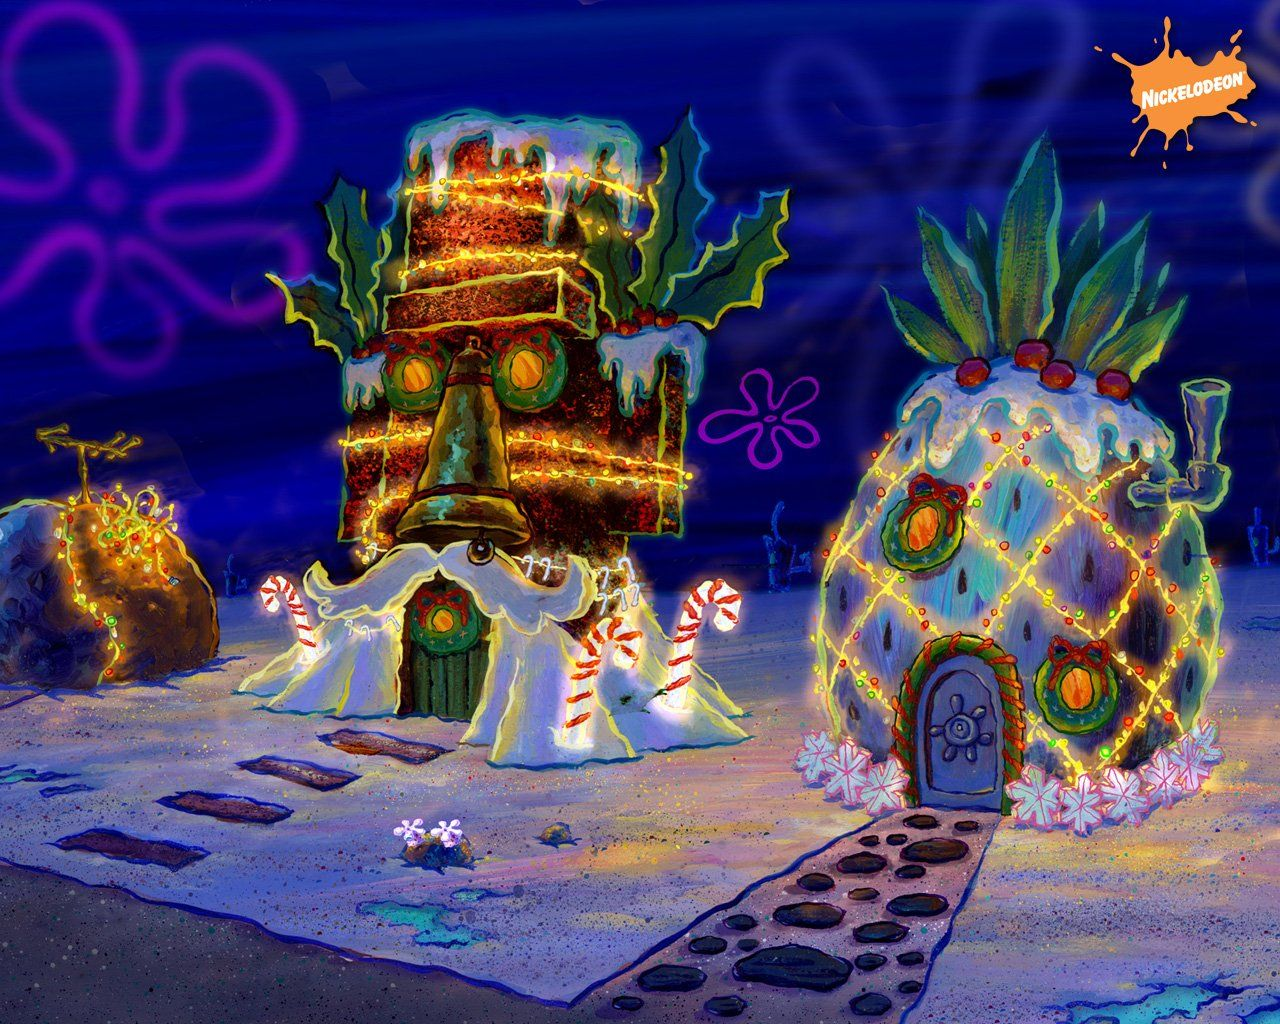 Hd Spongebob Squarepants 002 Wallpaper 3901 Hd Desktop